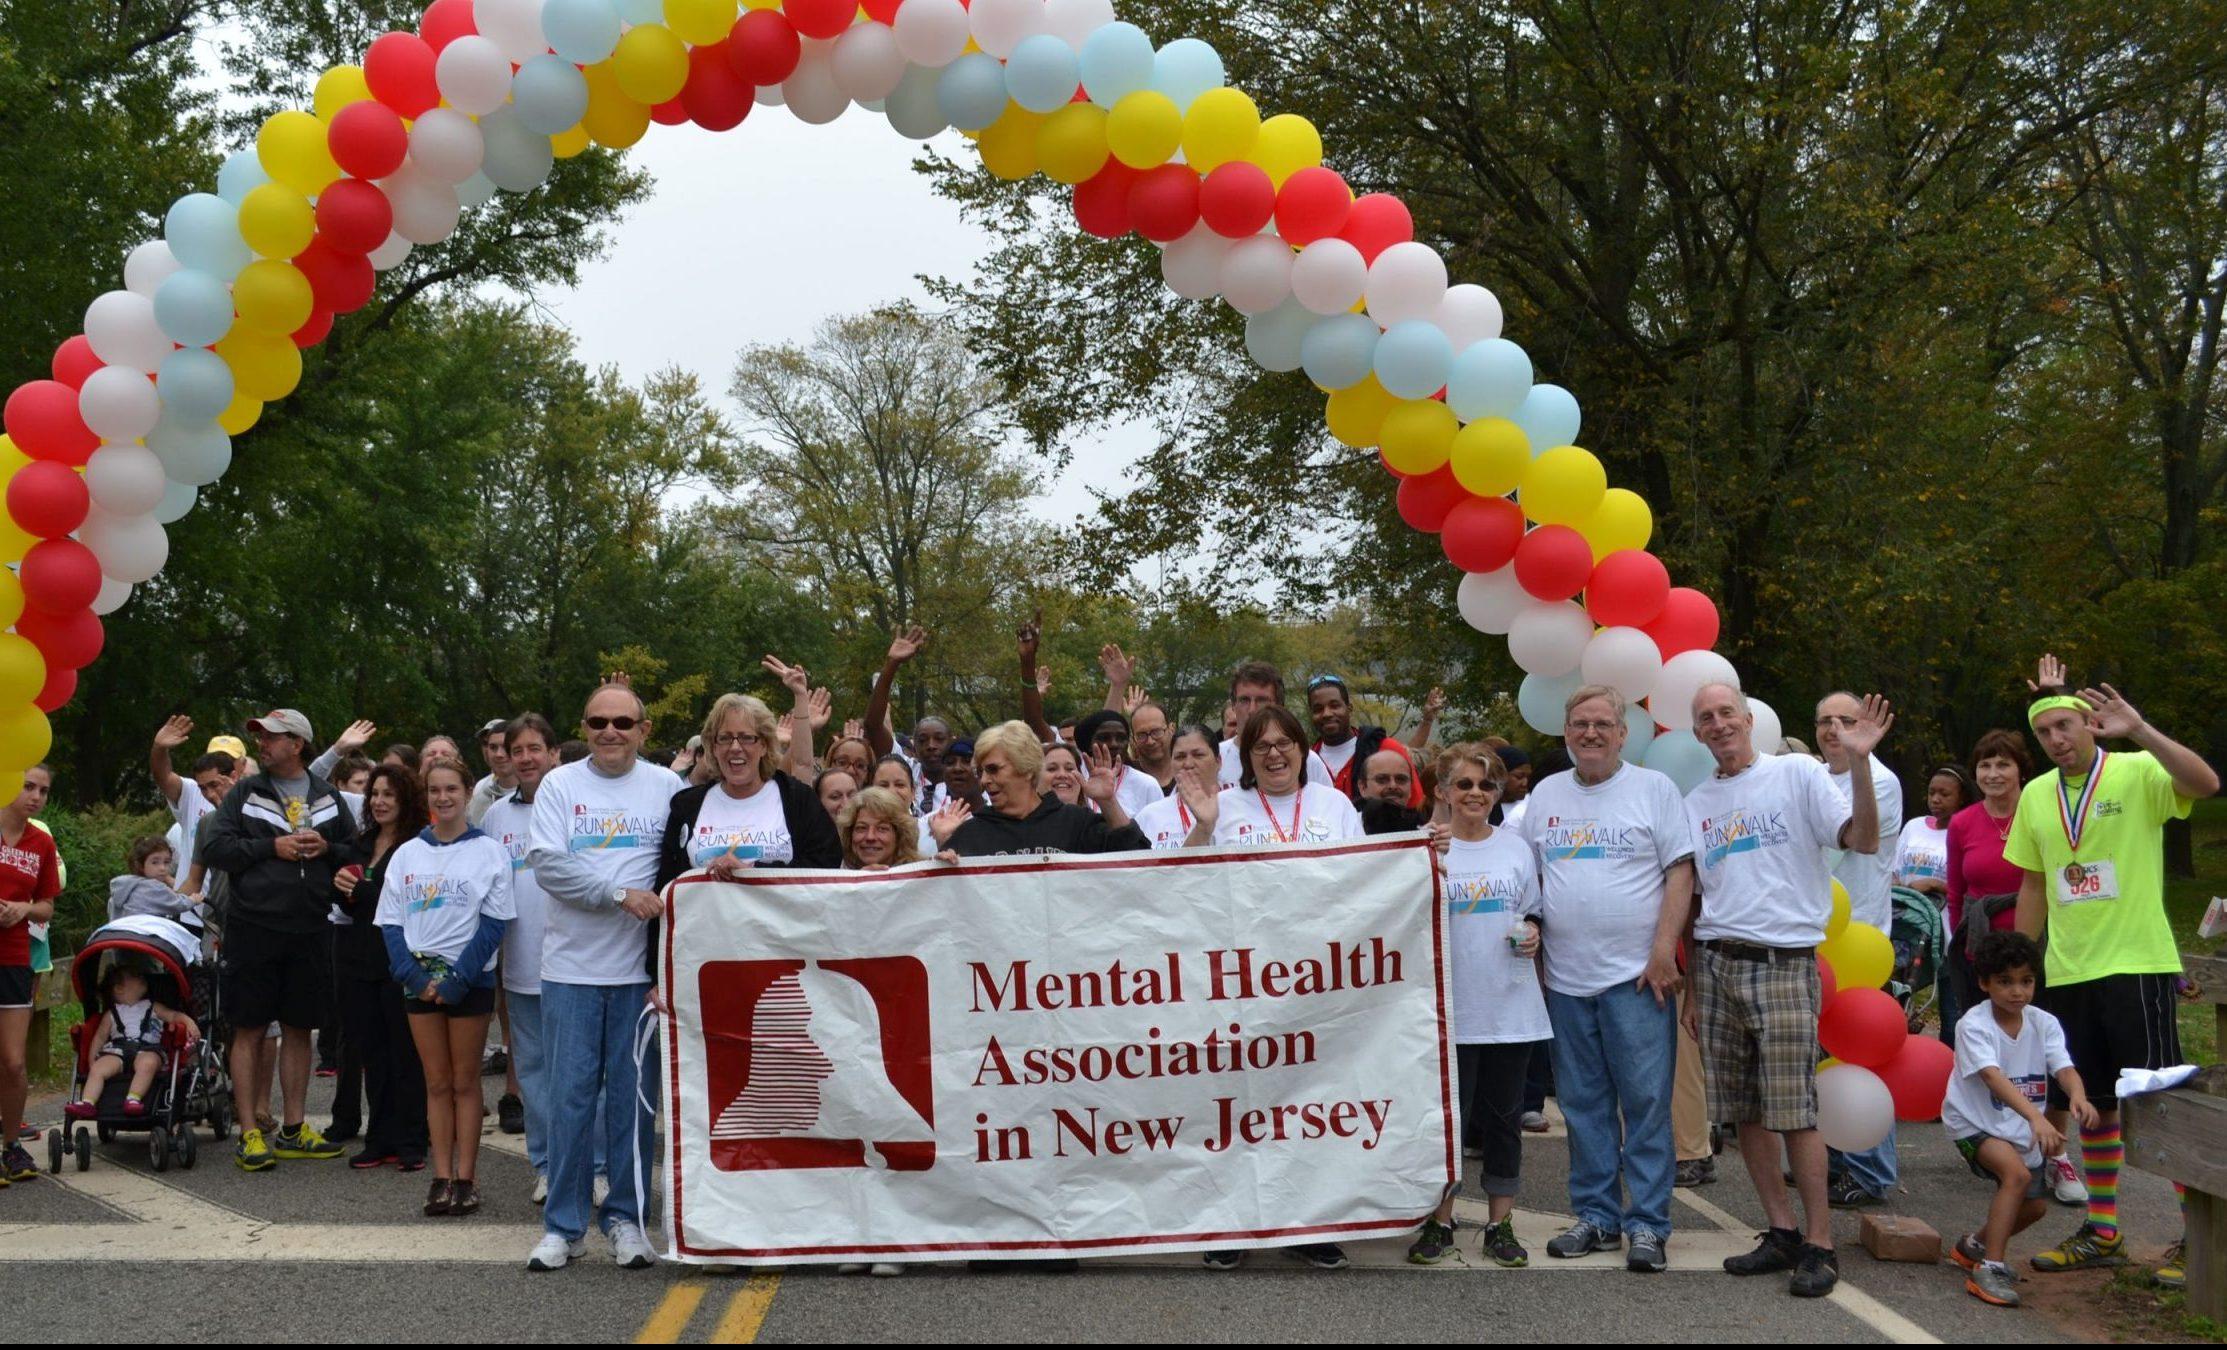 The Mental Health Association's 75th Anniversary